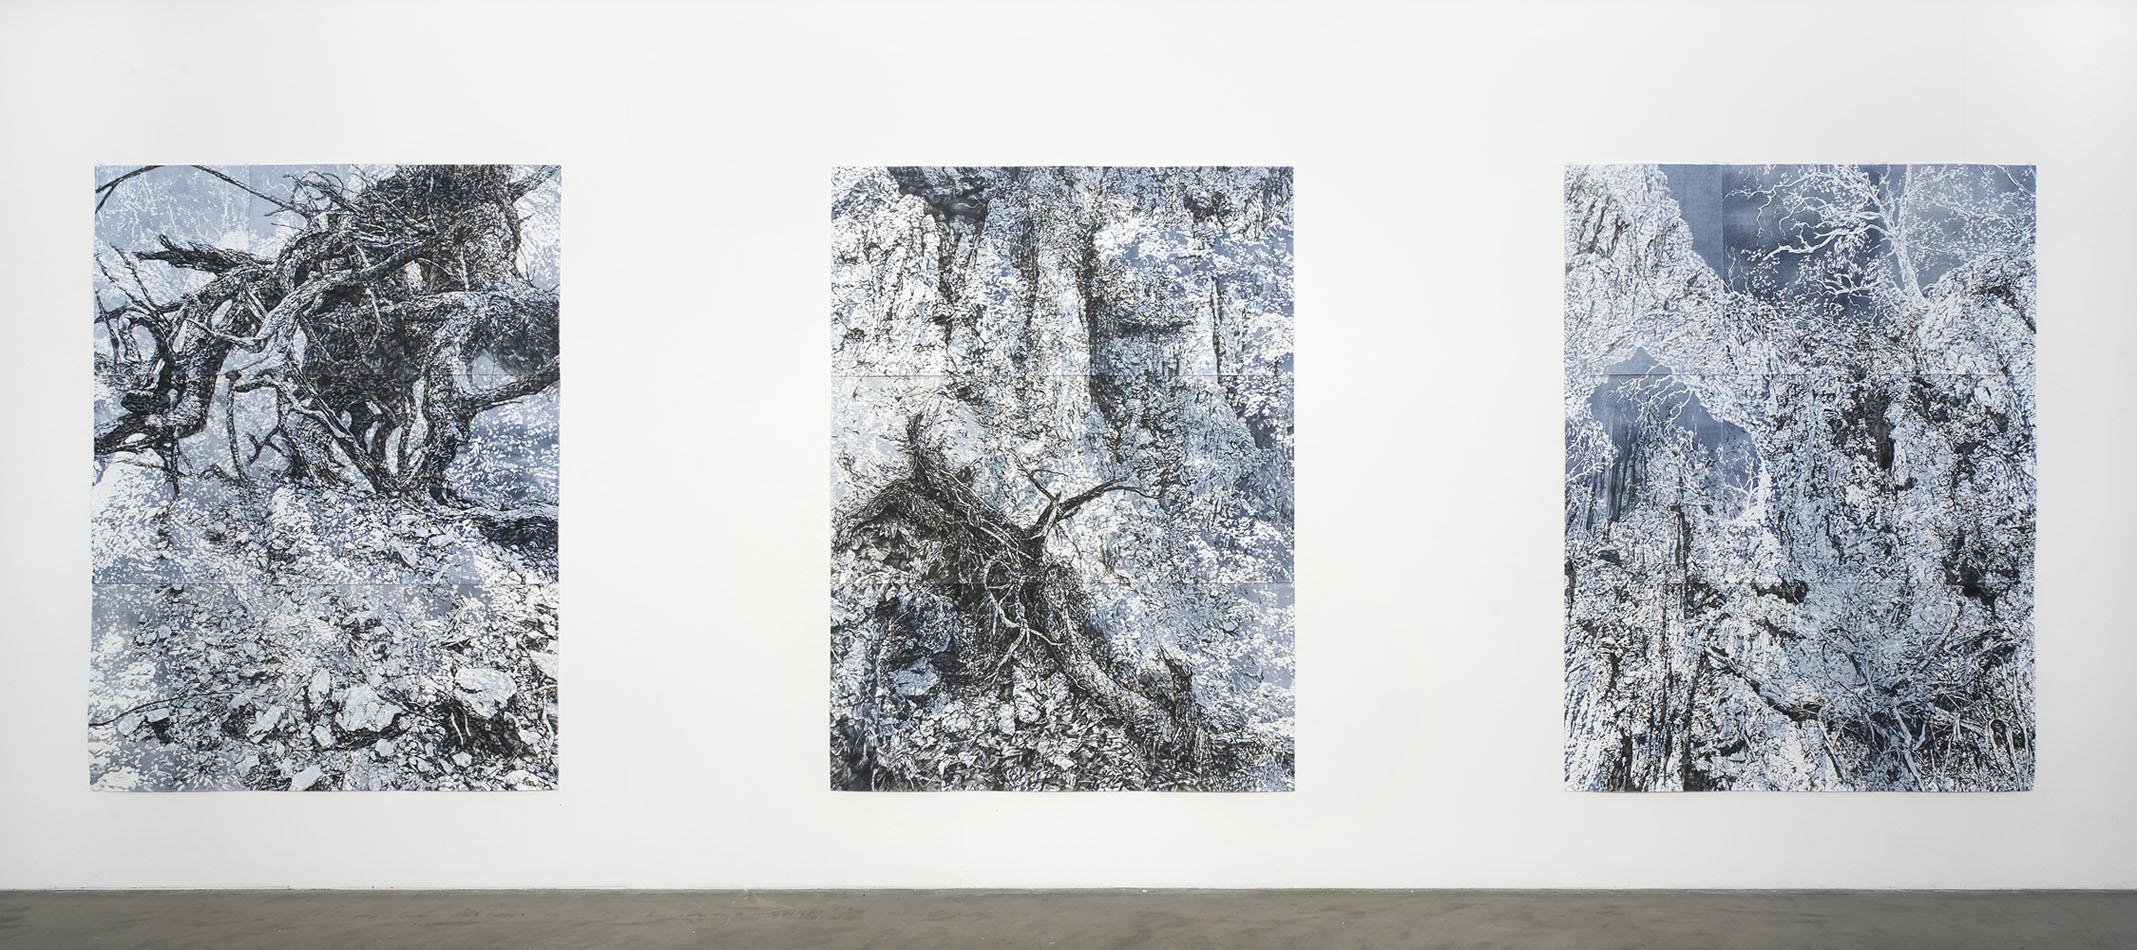 'Ghost' series in 'Precipice' solo exhibition, ANCA Gallery, Canberra